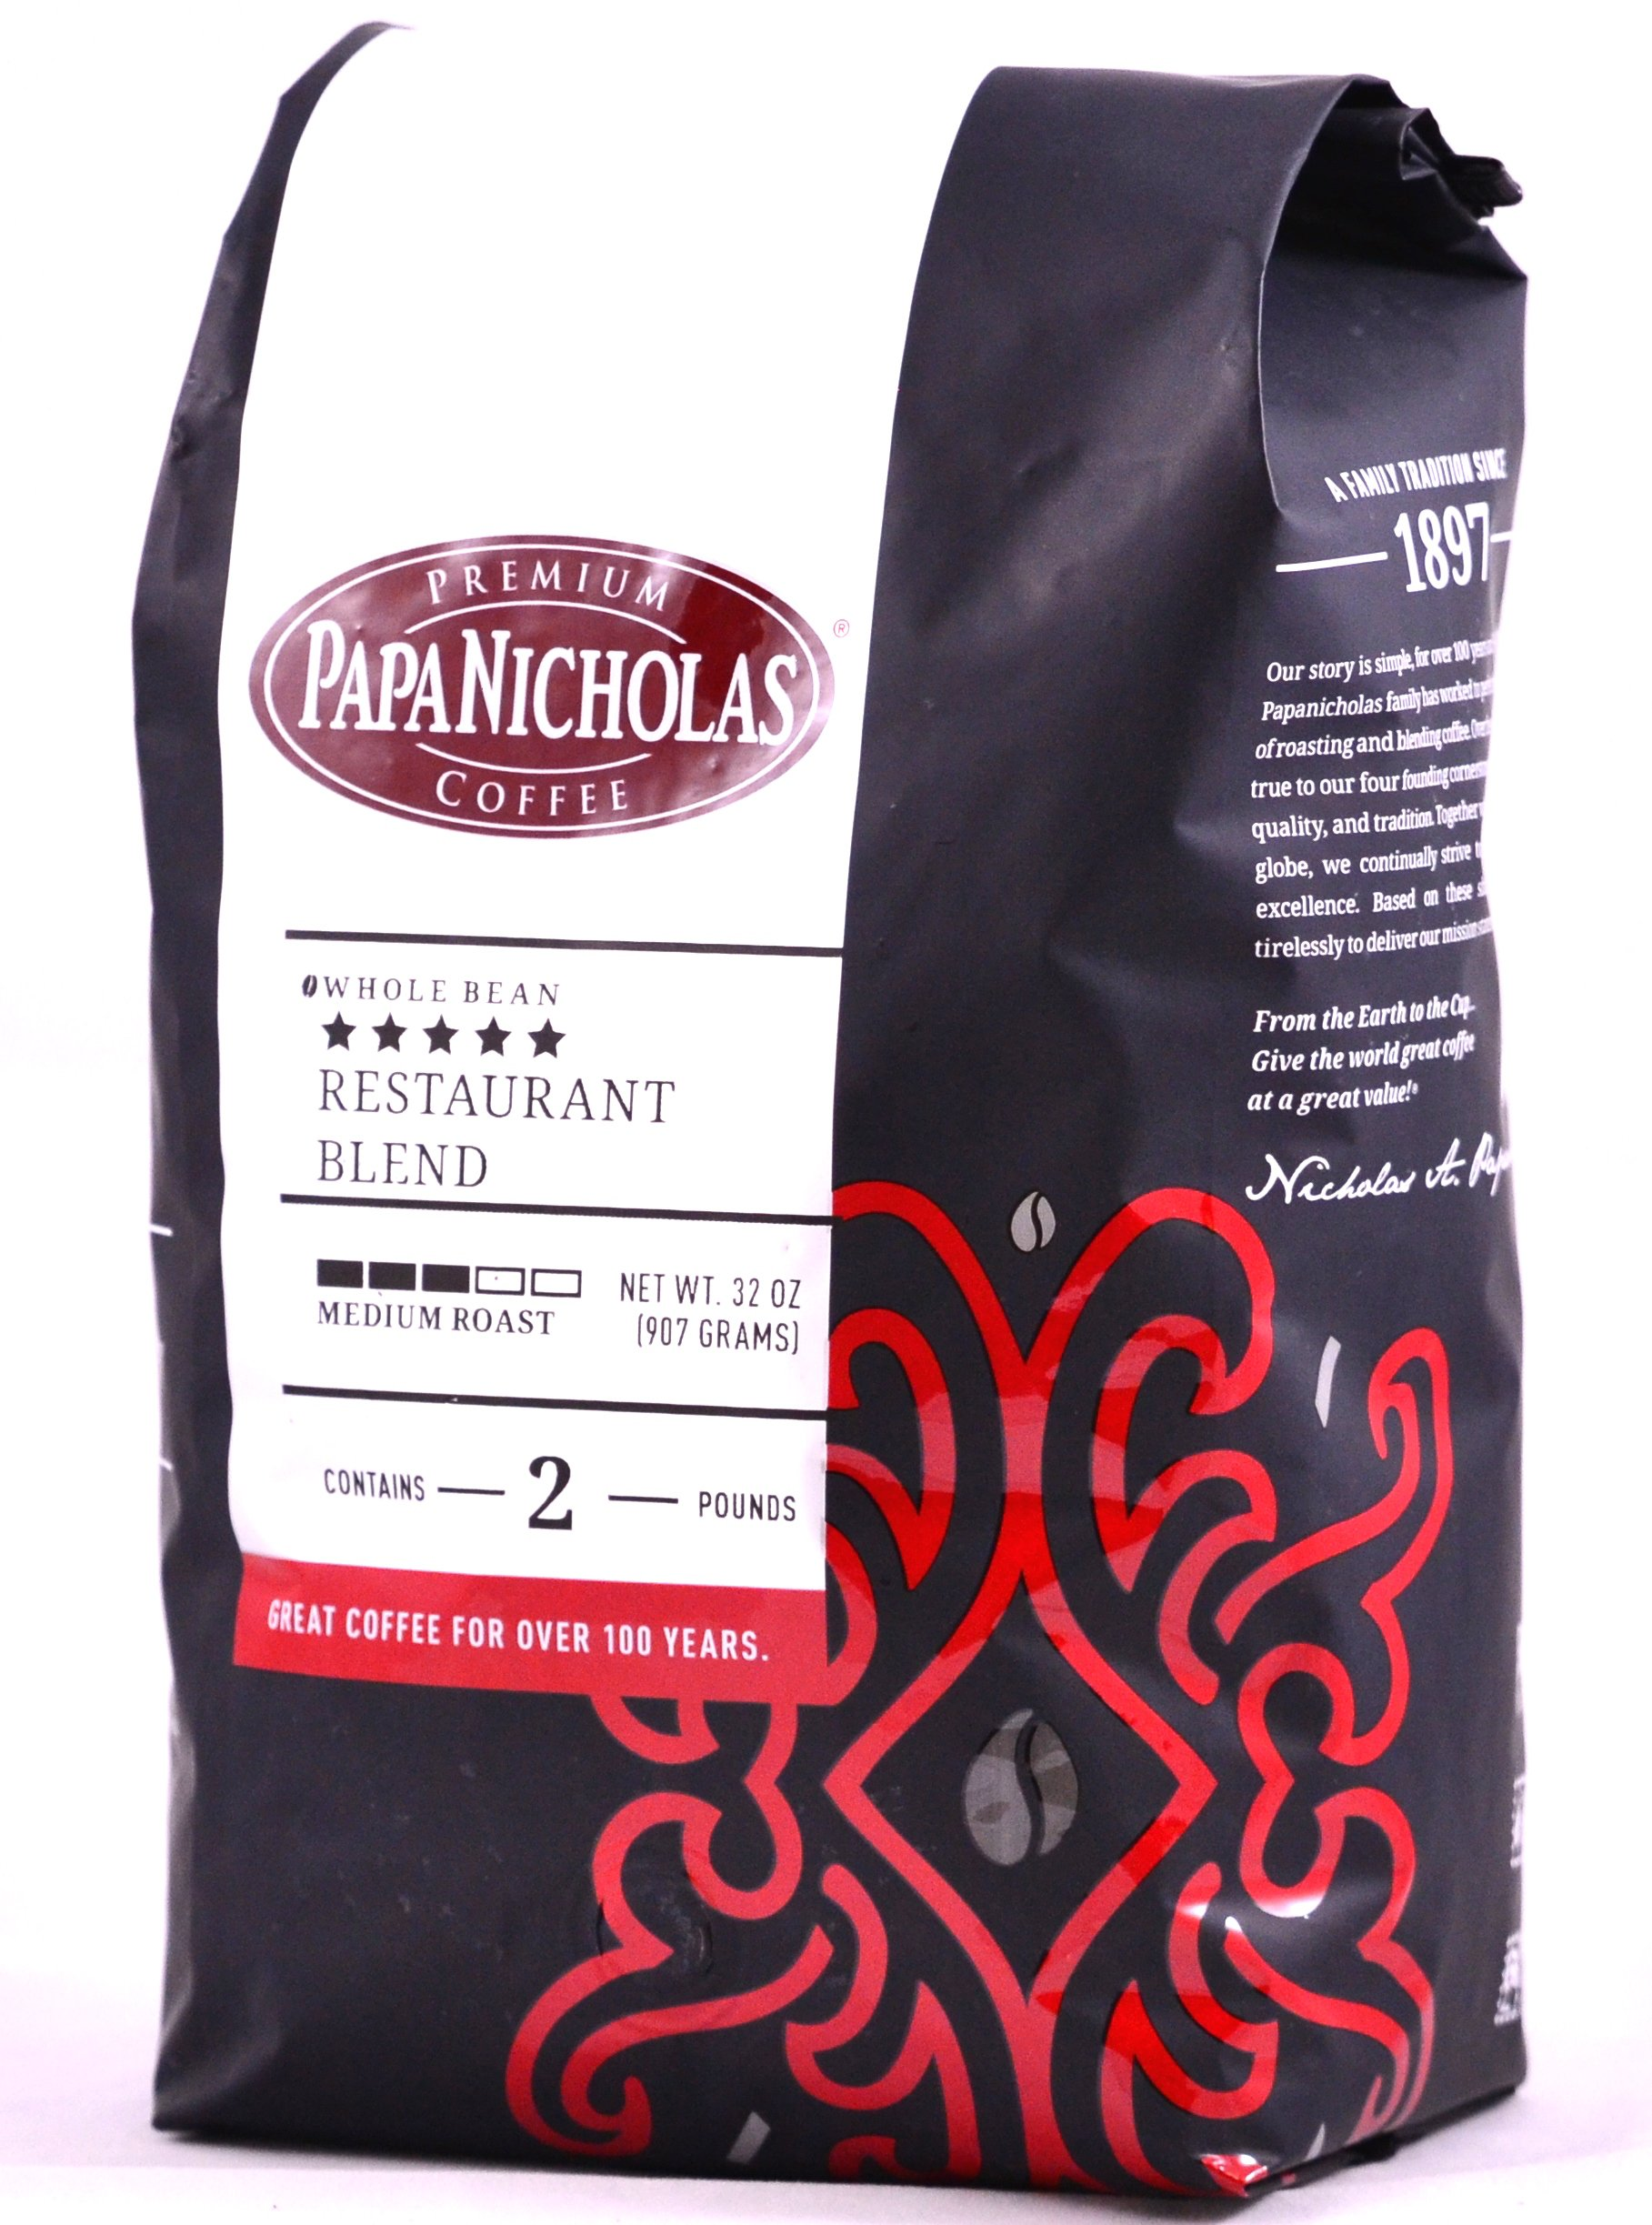 PapaNicholas Coffee Whole Bean Coffee, 5-star Restaurant Blend, 2 Pound